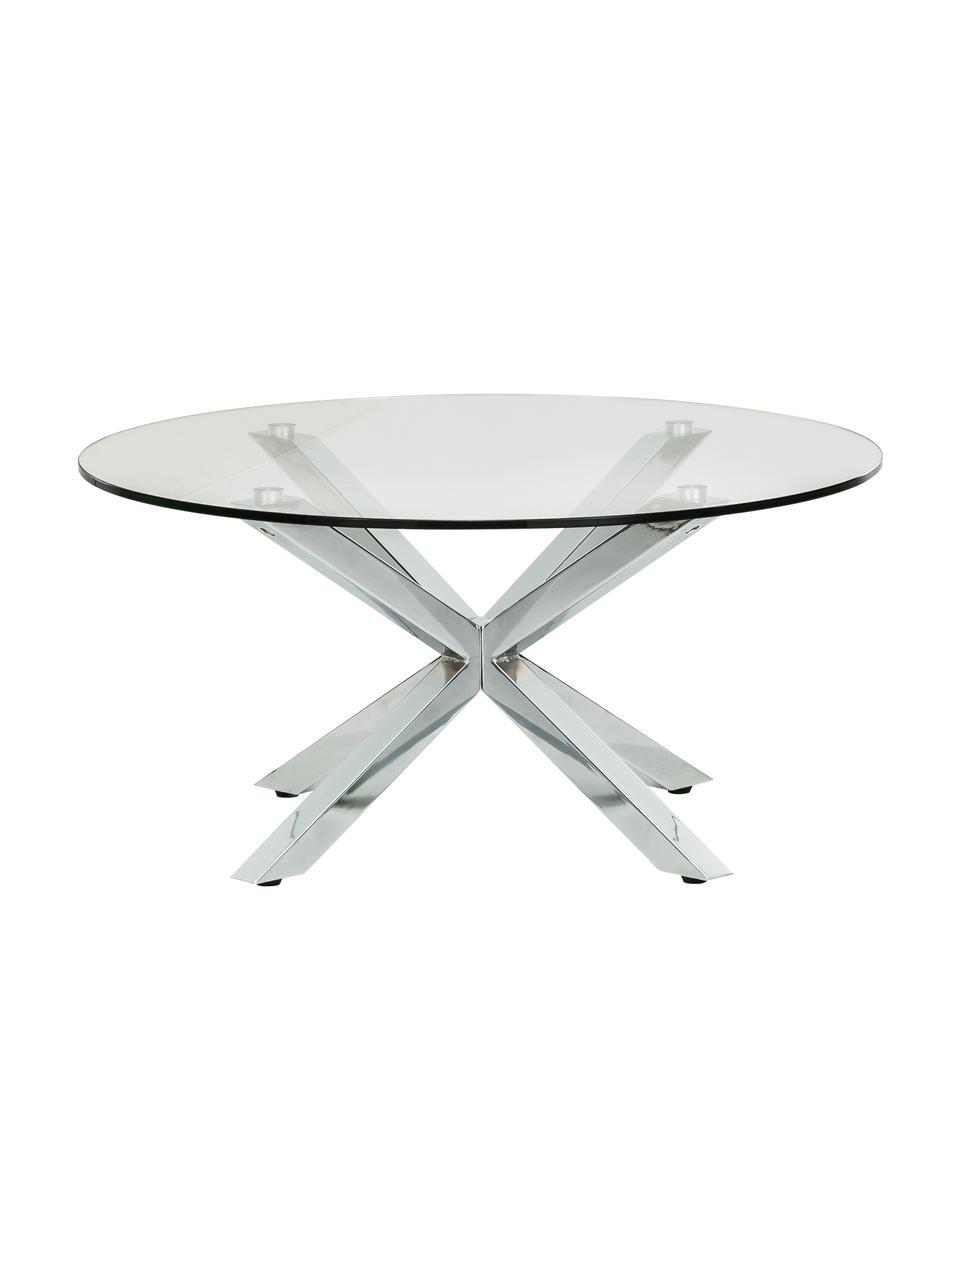 table basse ronde en metal et verre emilie